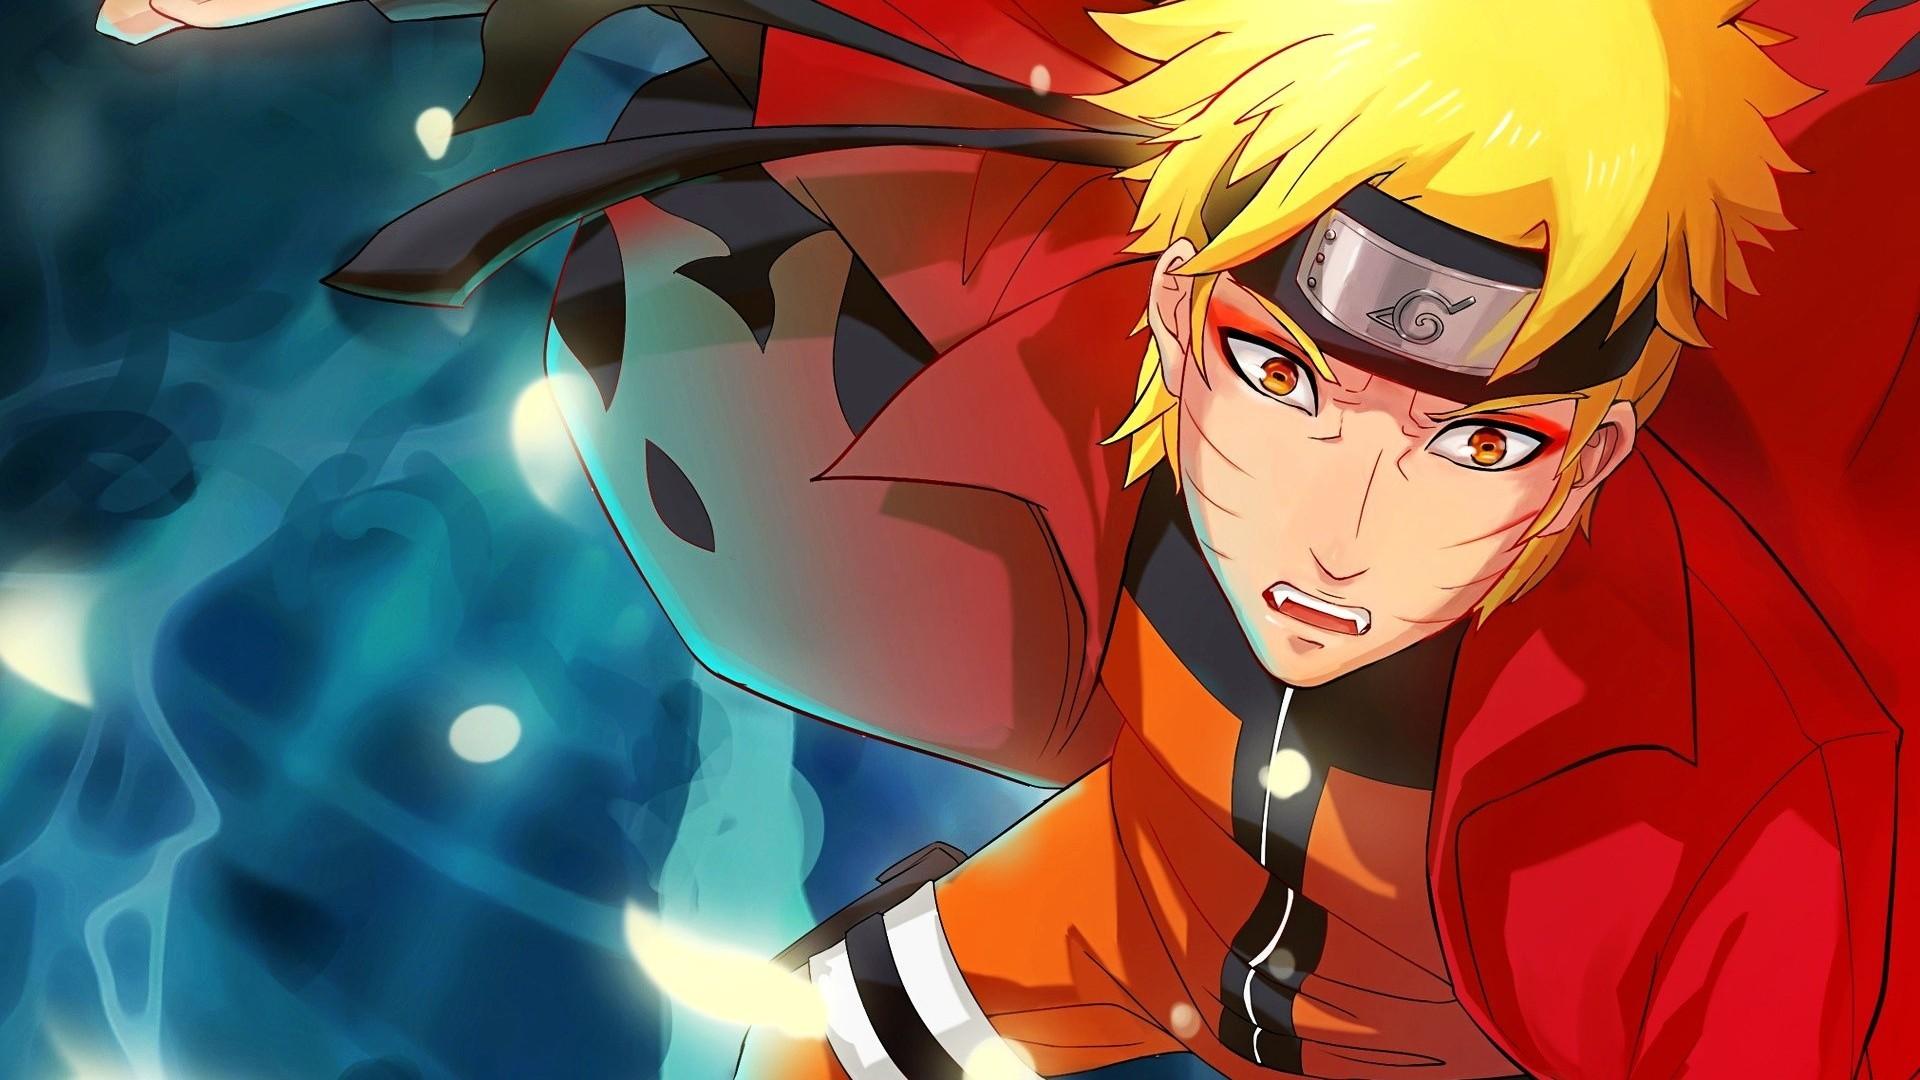 Beautiful Wallpaper Naruto Gambar - 575480  Pictures_42398.jpg